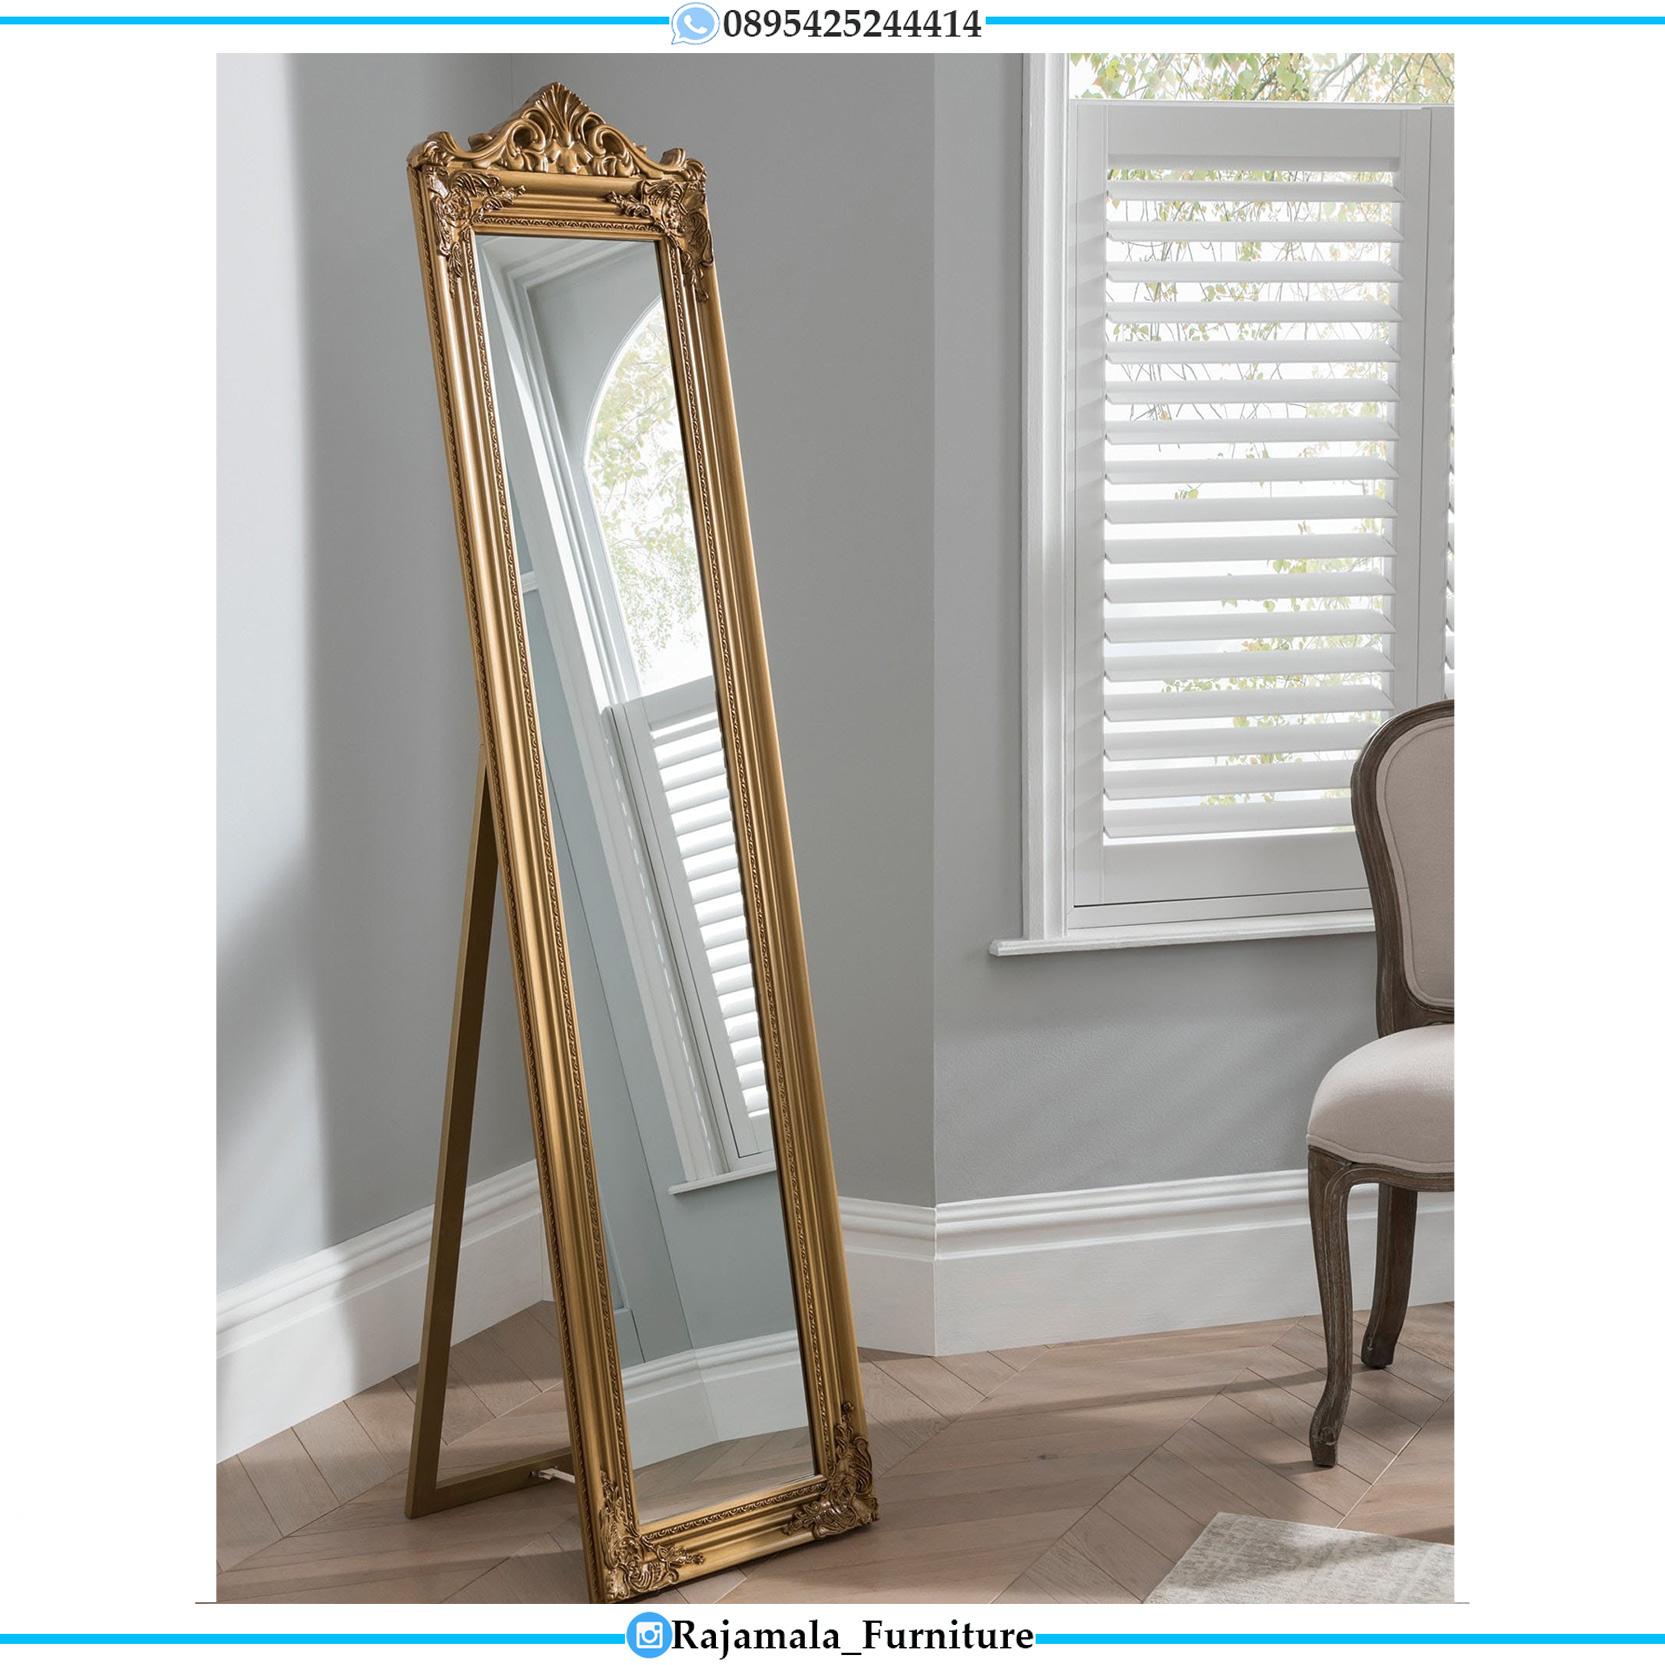 Stand Mirror Luxury Classic, Kaca Rias Mewah Ukiran Klasik Jepara RM-0119